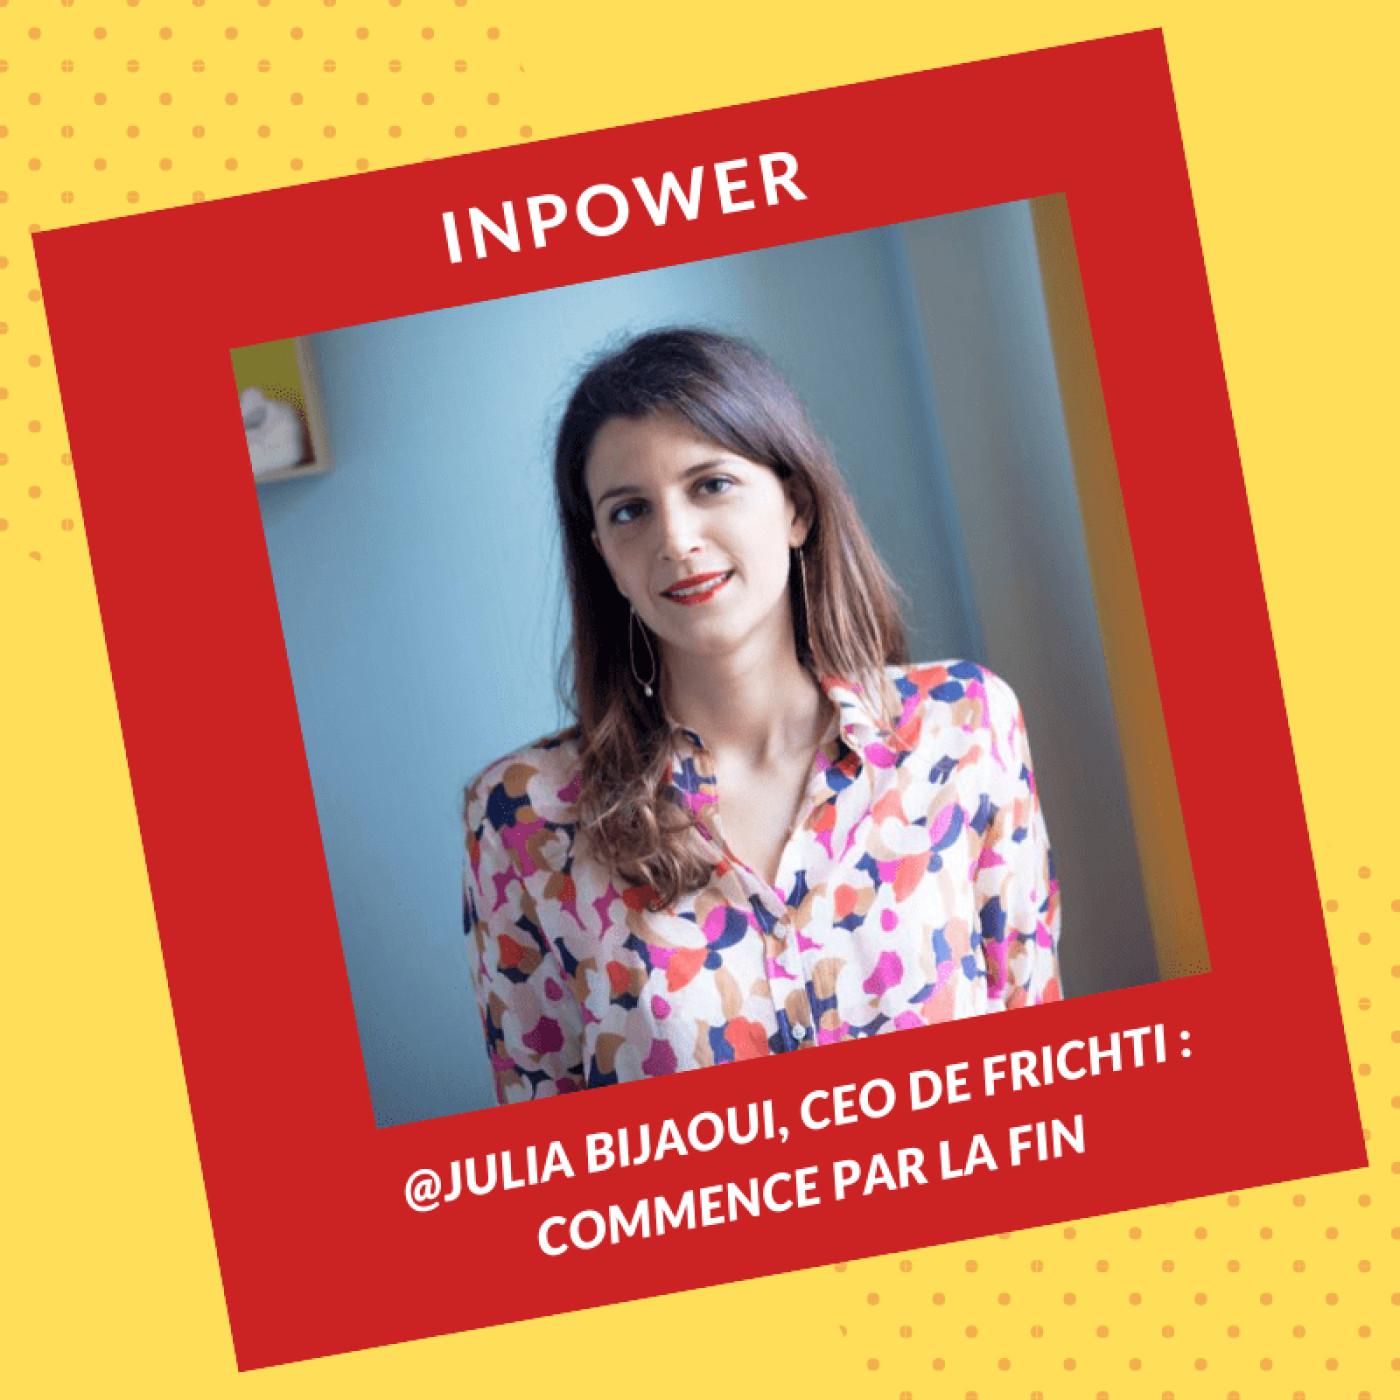 Julia Bijaoui, CEO de Frichti - Commence par la fin